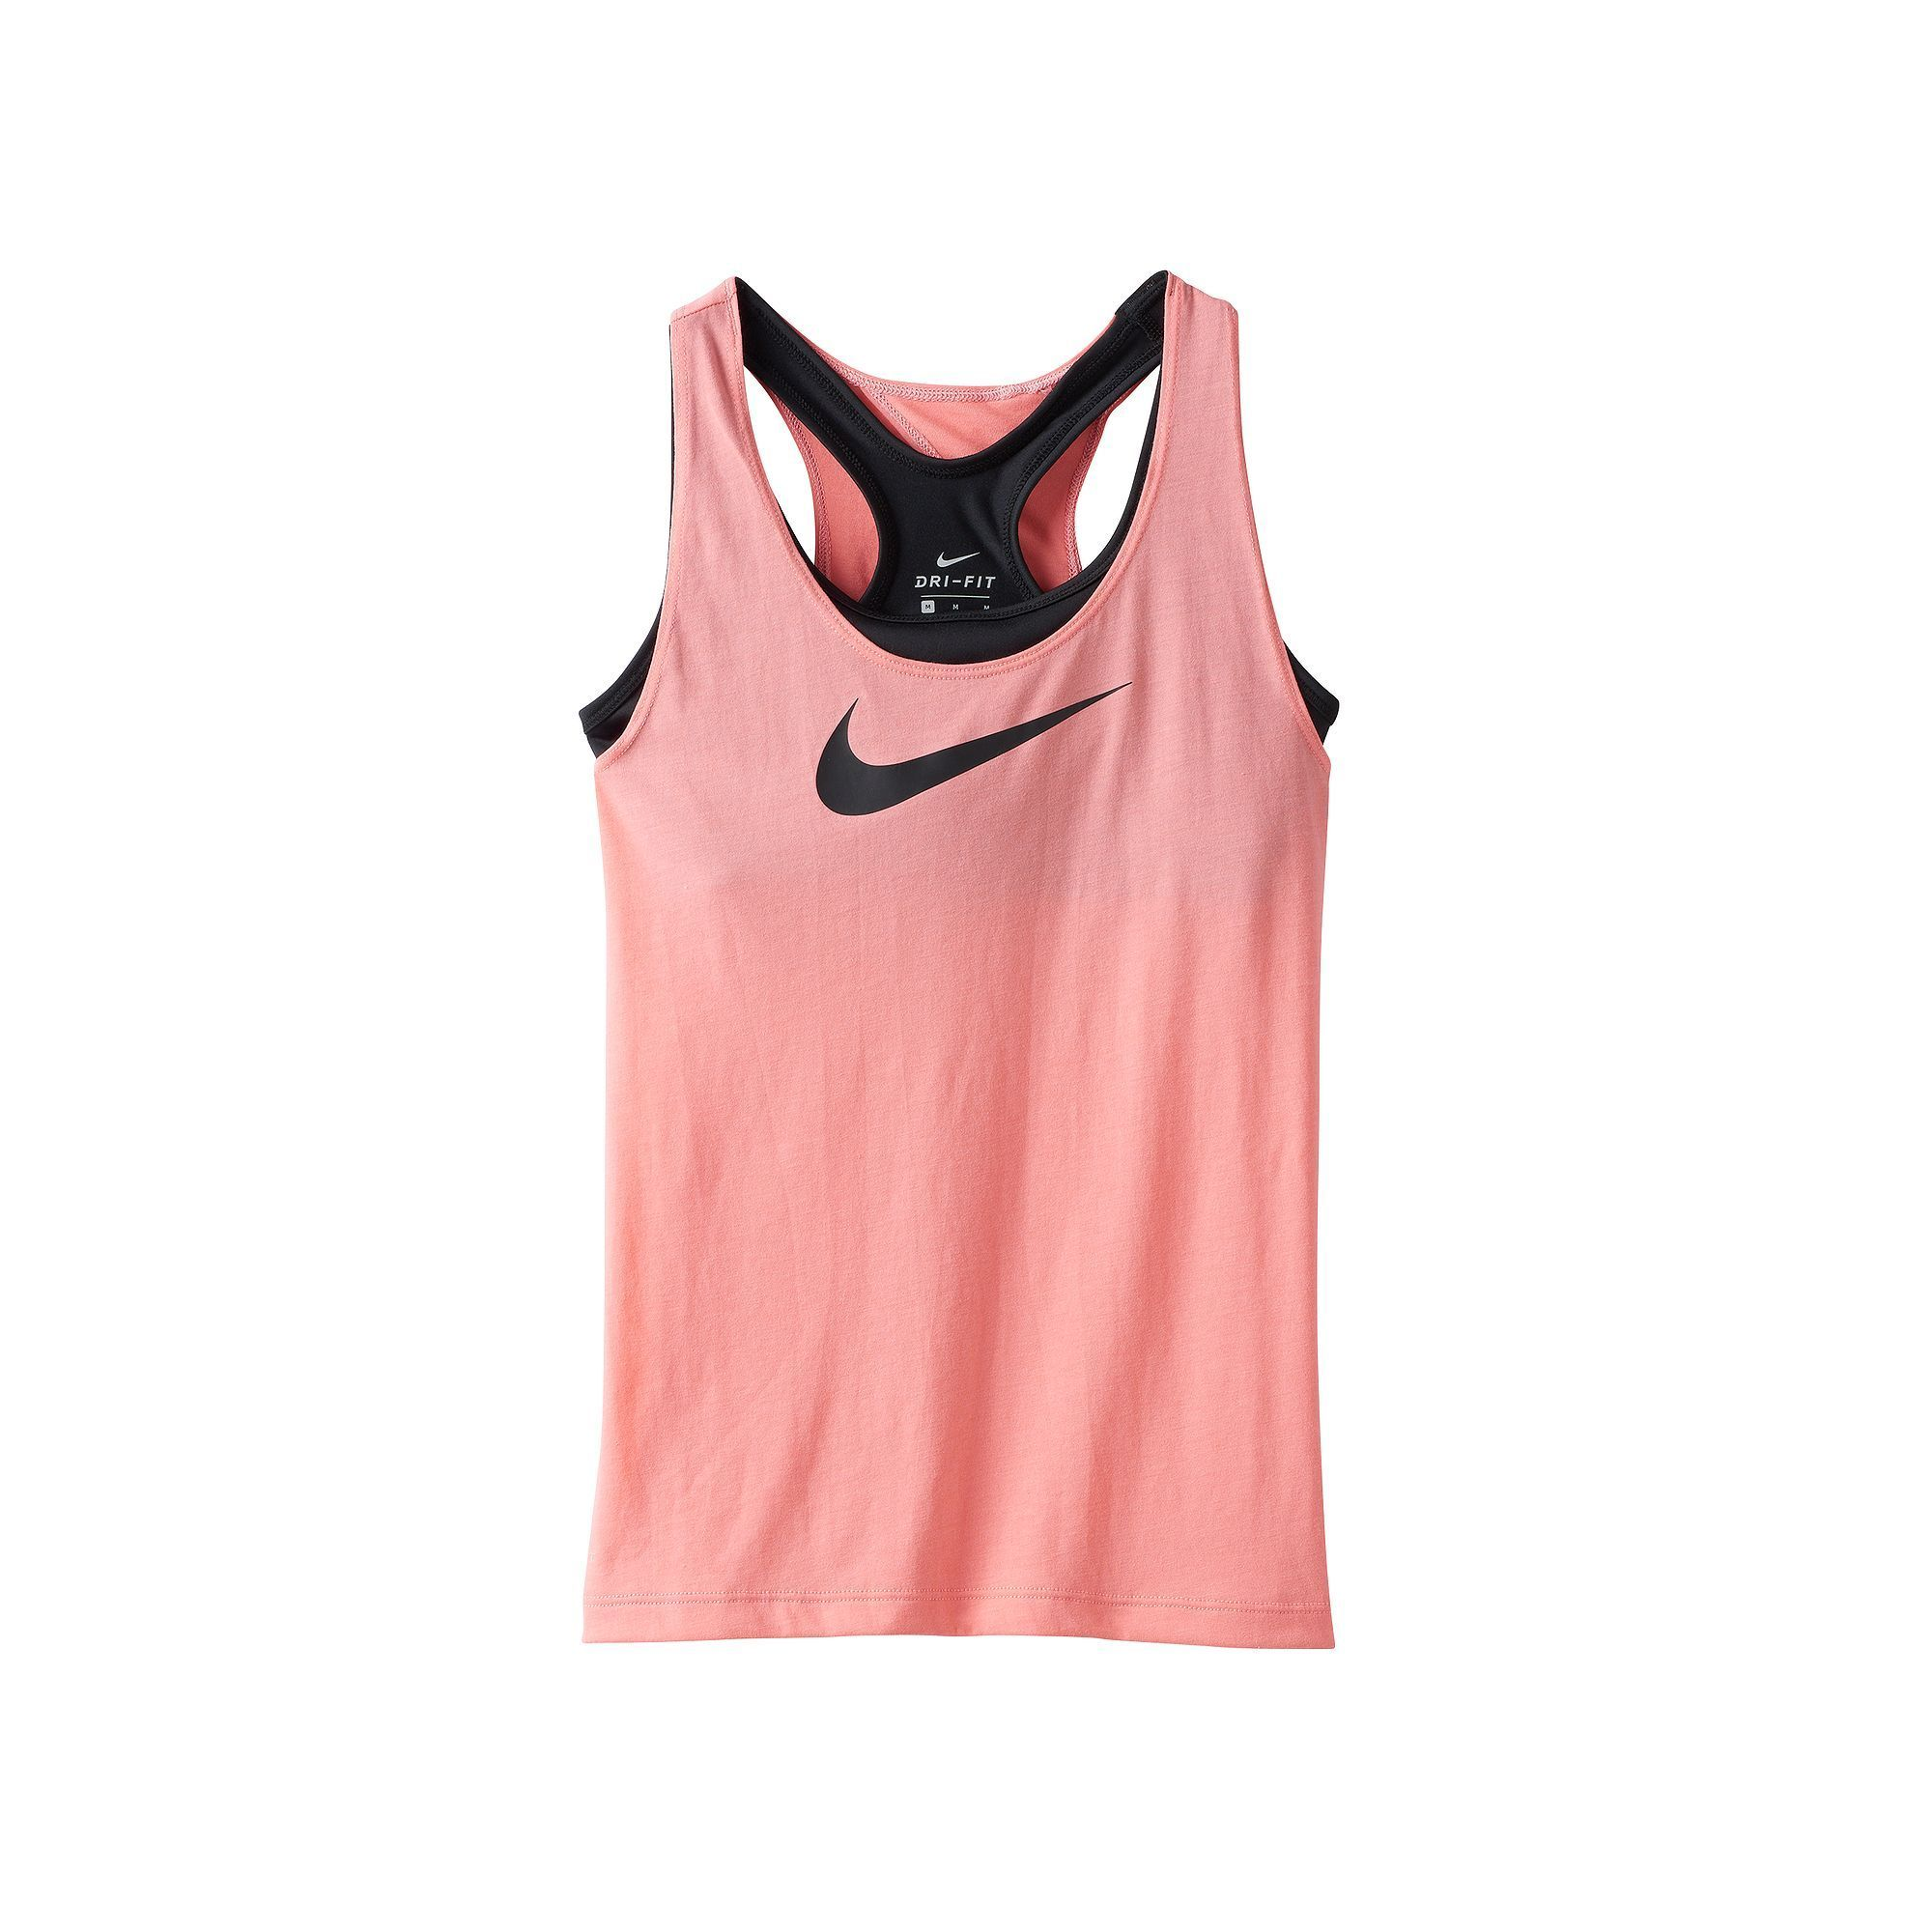 5ab843b6a6d53 Girls 7-16 Nike Swoosh Built-In Sports Bra Racerback Tank Top ...